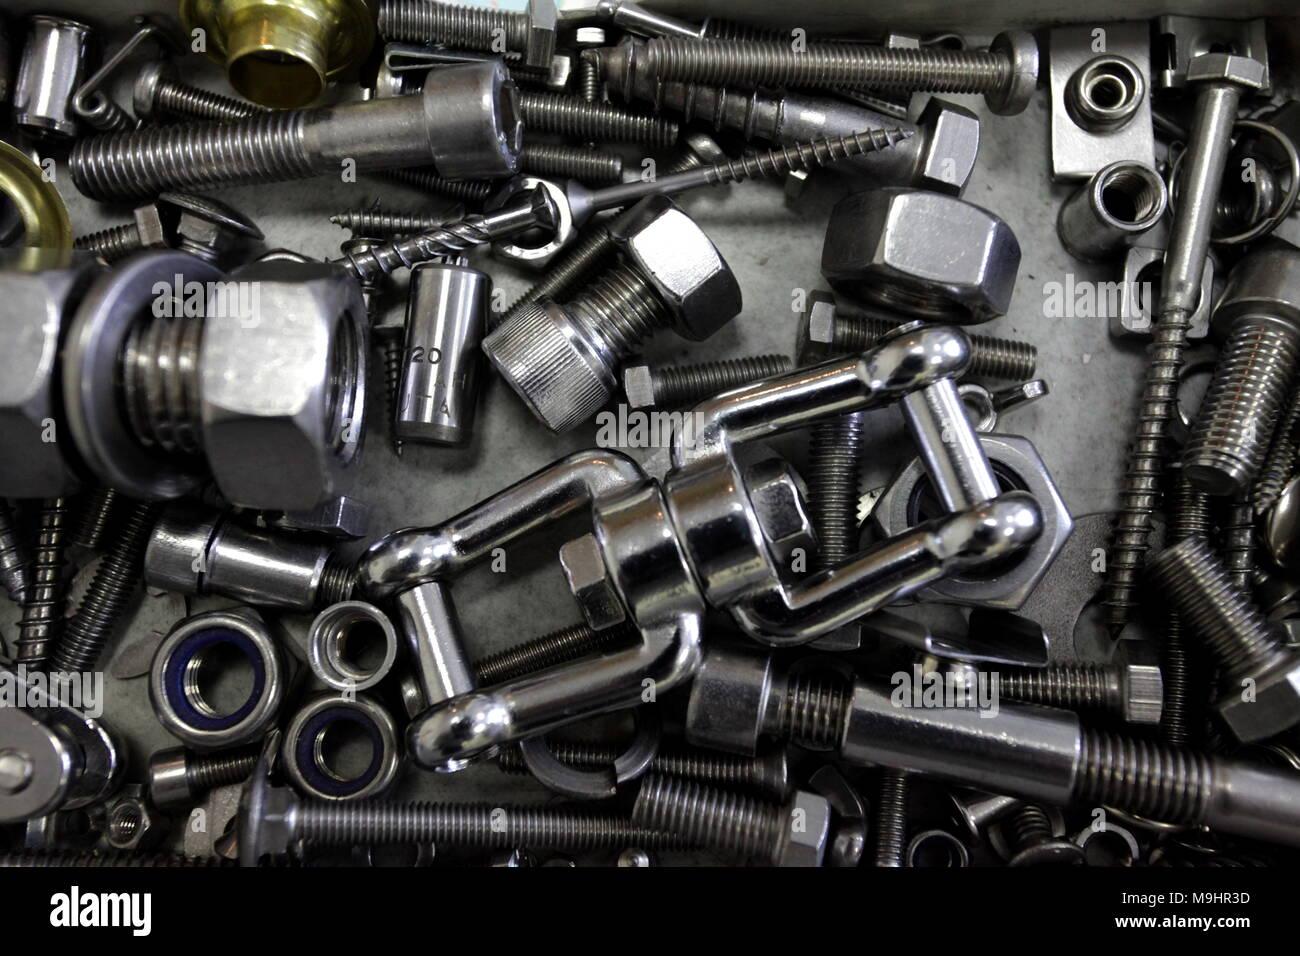 bolts nuts washers hardware background Stock Photo: 178026897 - Alamy